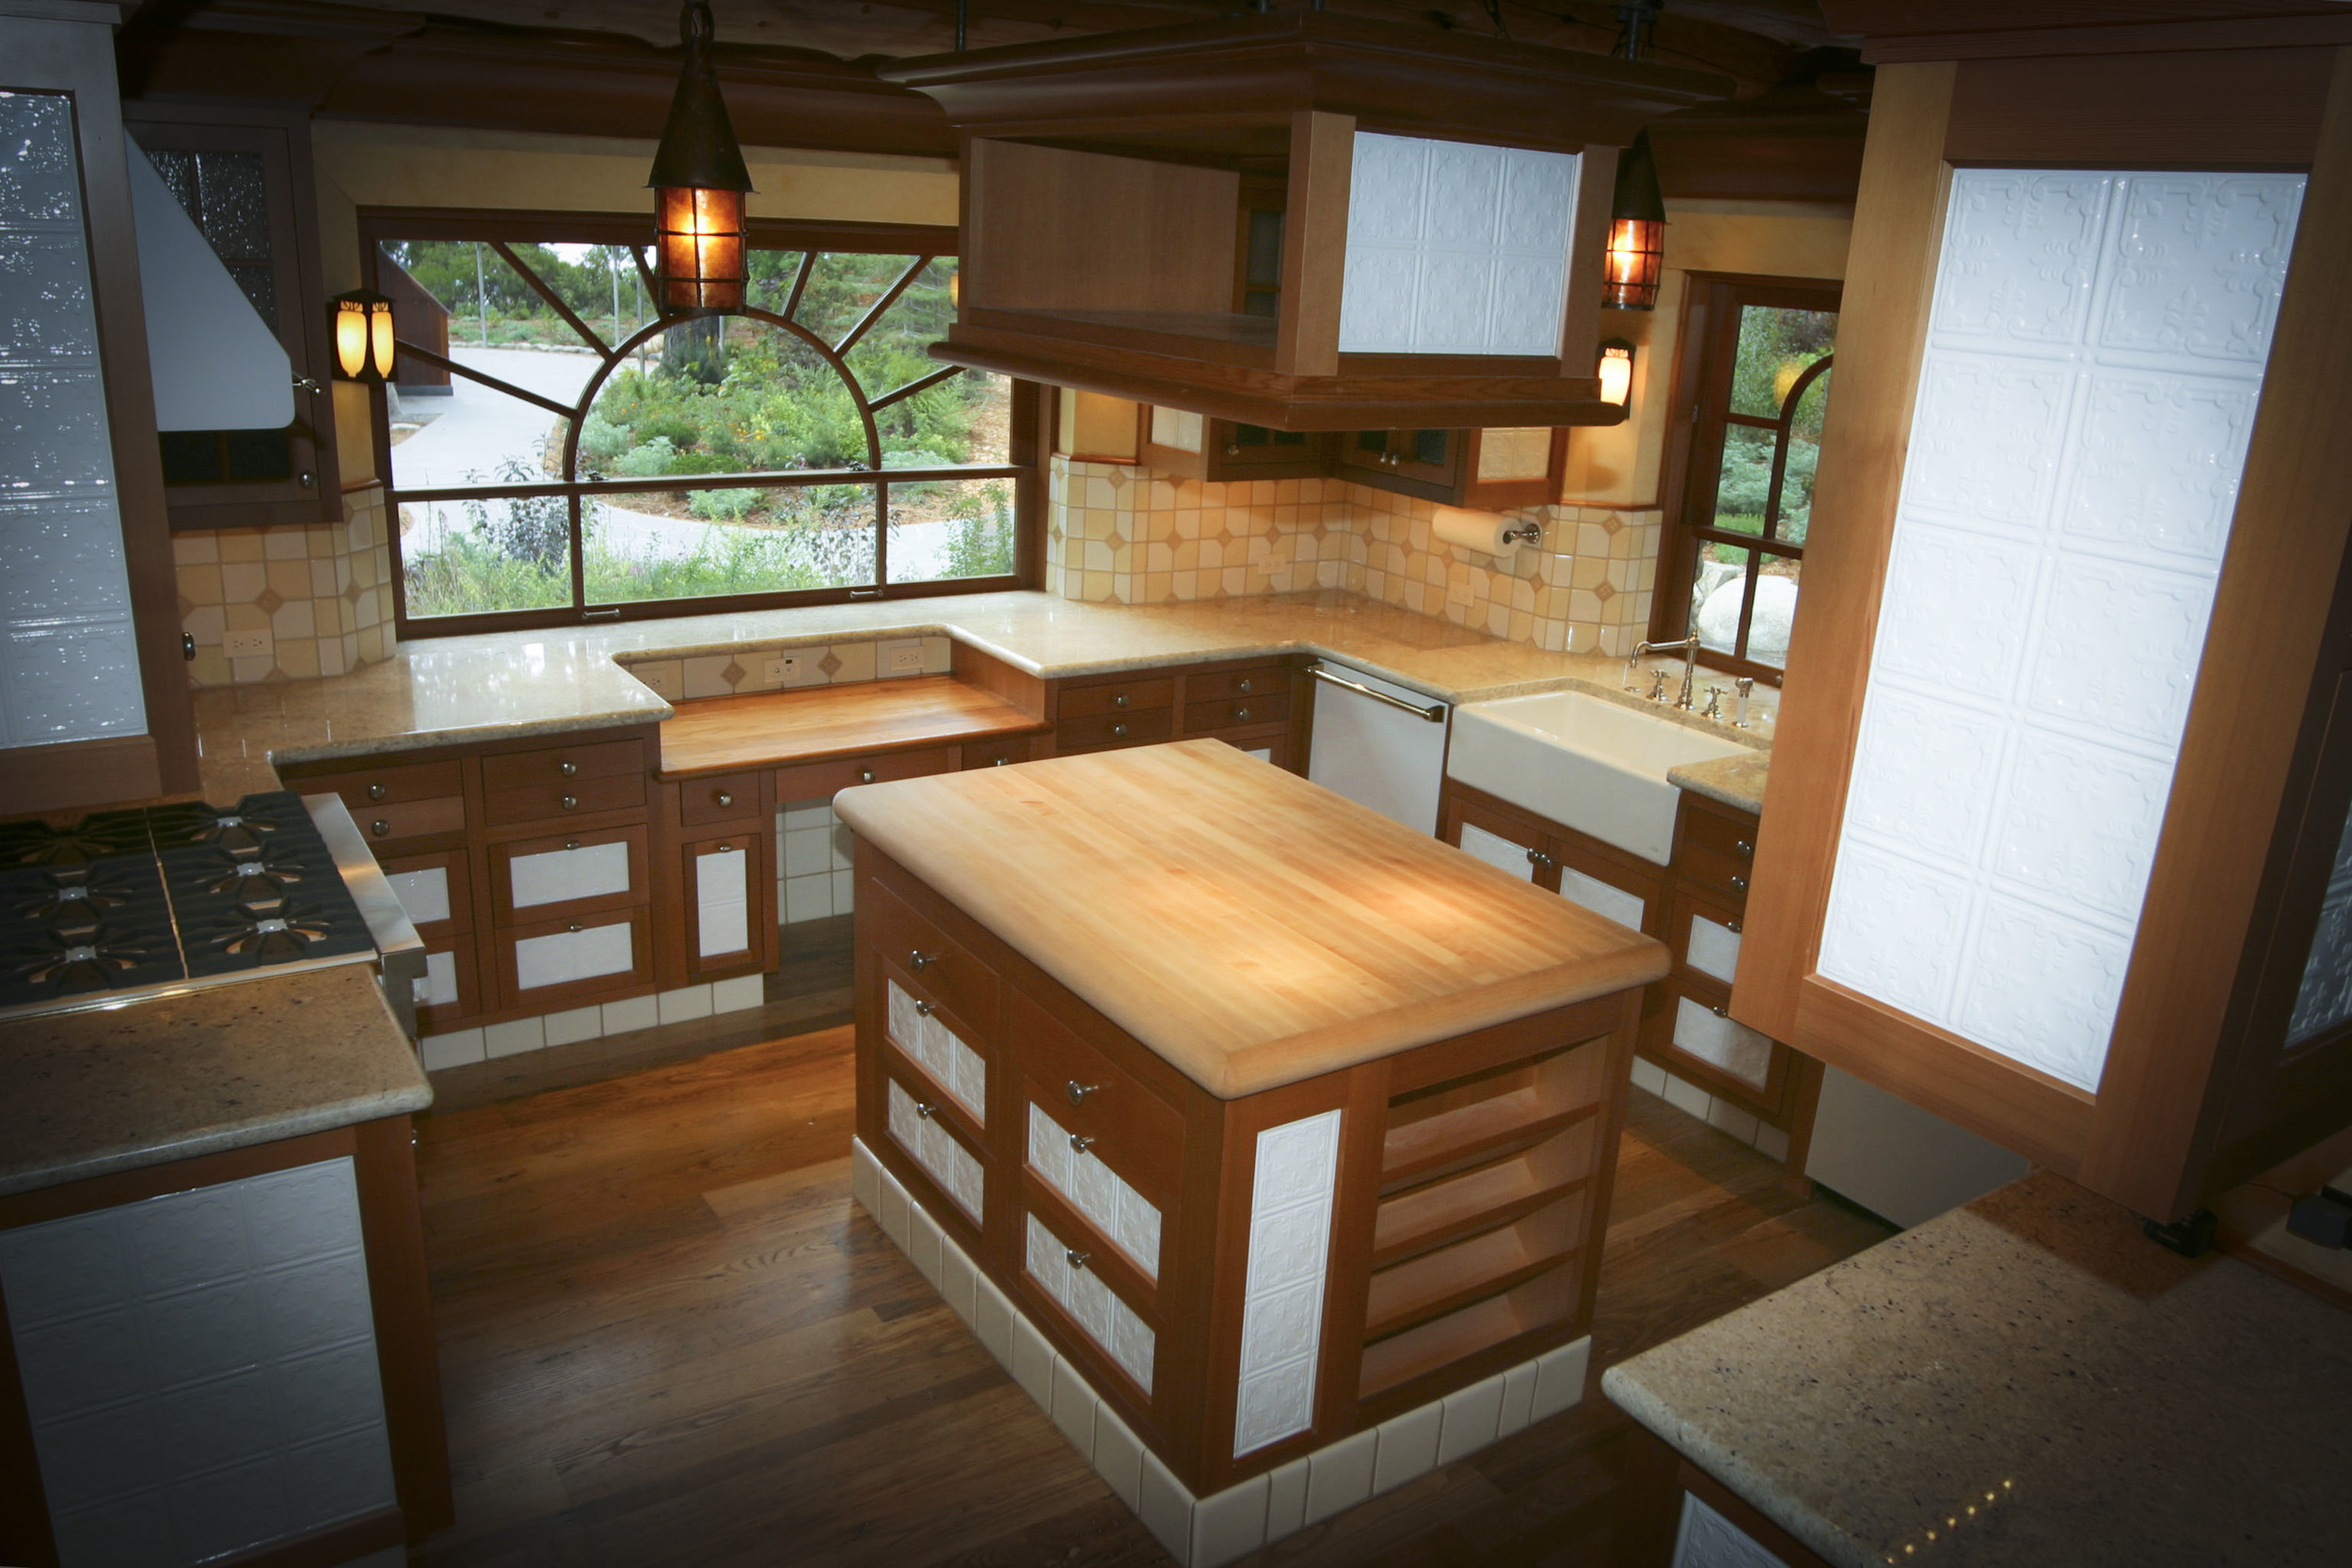 kitchens017.jpg